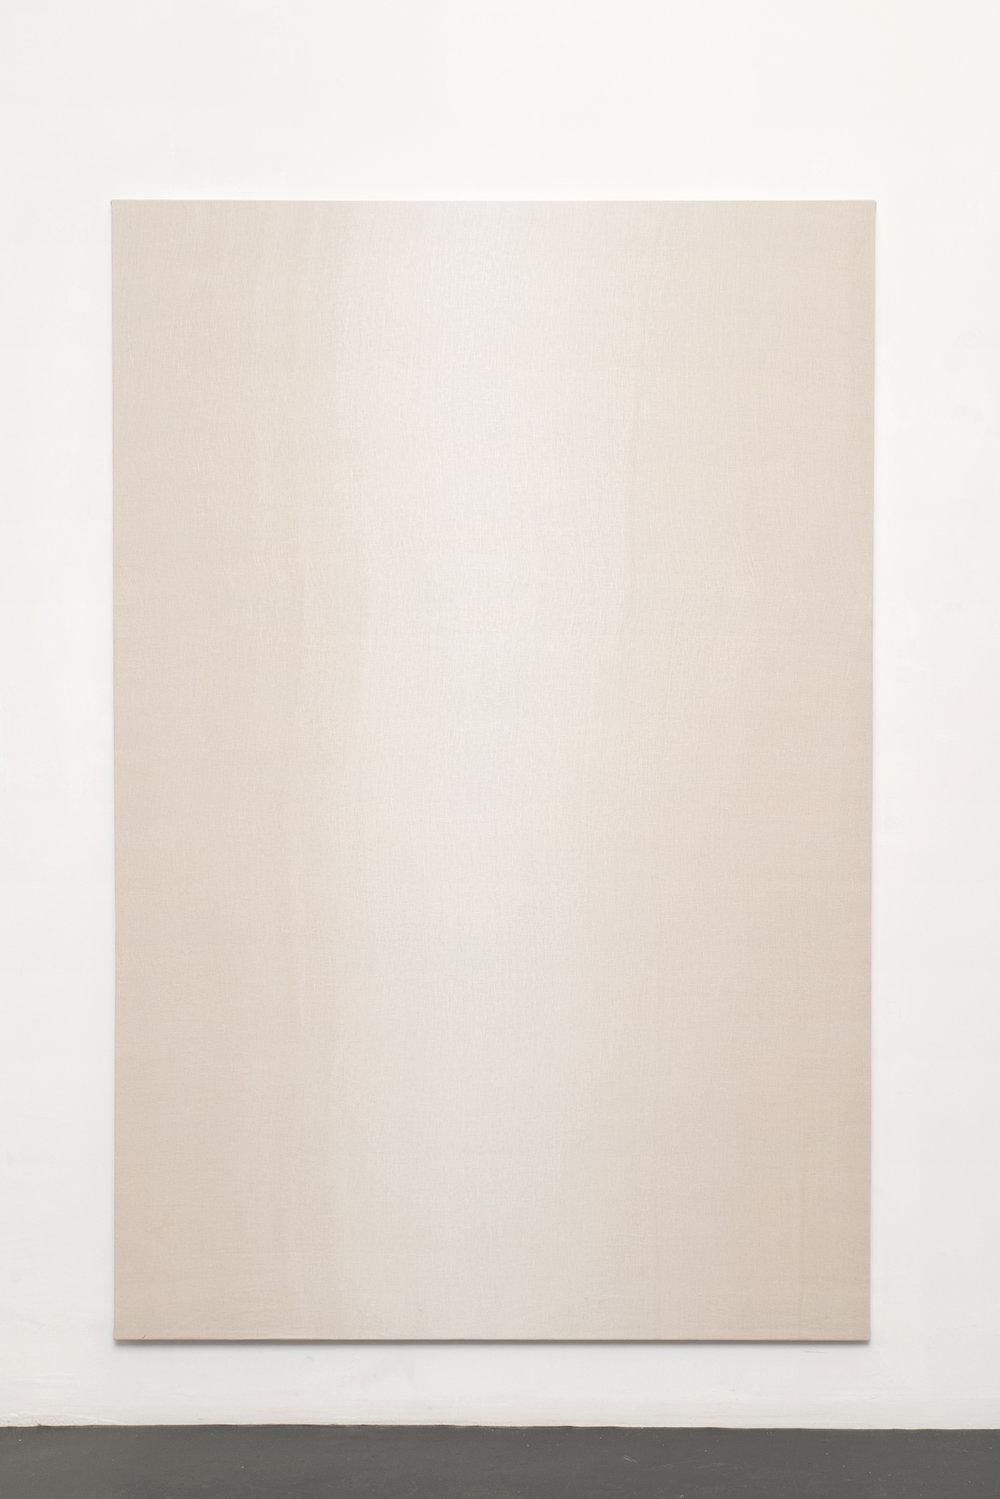 Camila Oliveira Fairclough, Creamy, 2014 tinted linen 194,5 x 129,5 x 2,5 cm - 76 5/8 x 51 x 1 inches